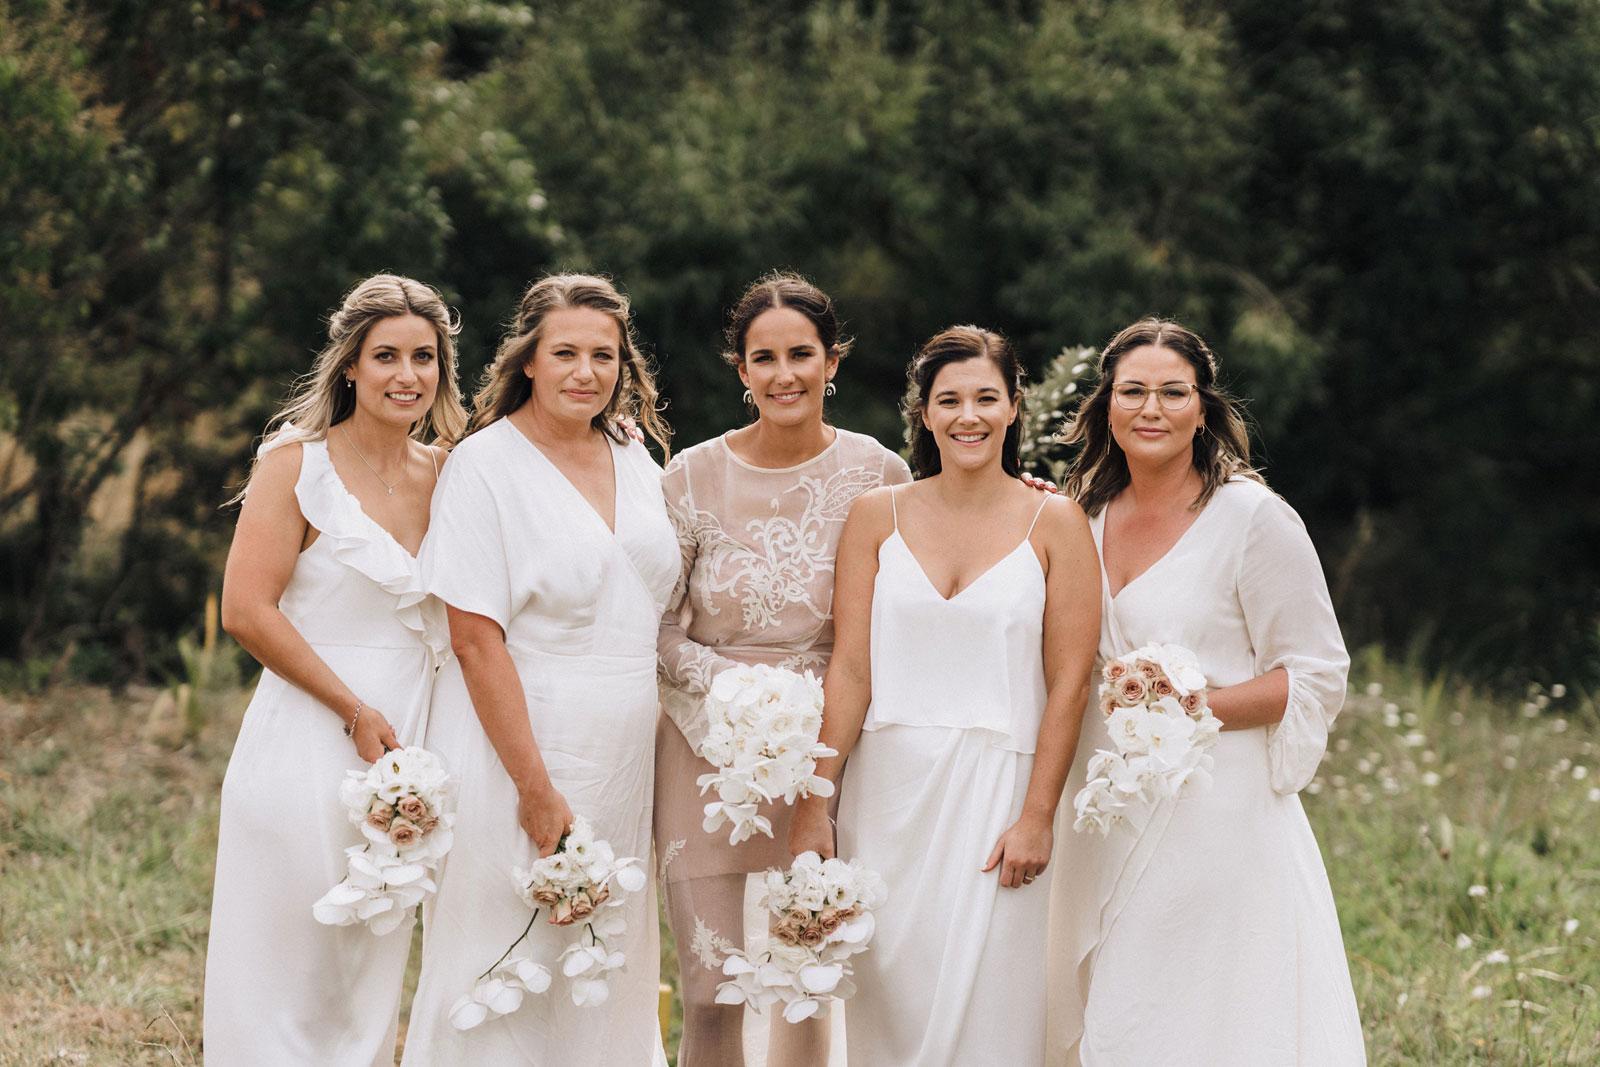 newfound-s-t-hunua-auckland-wedding-photographers-055